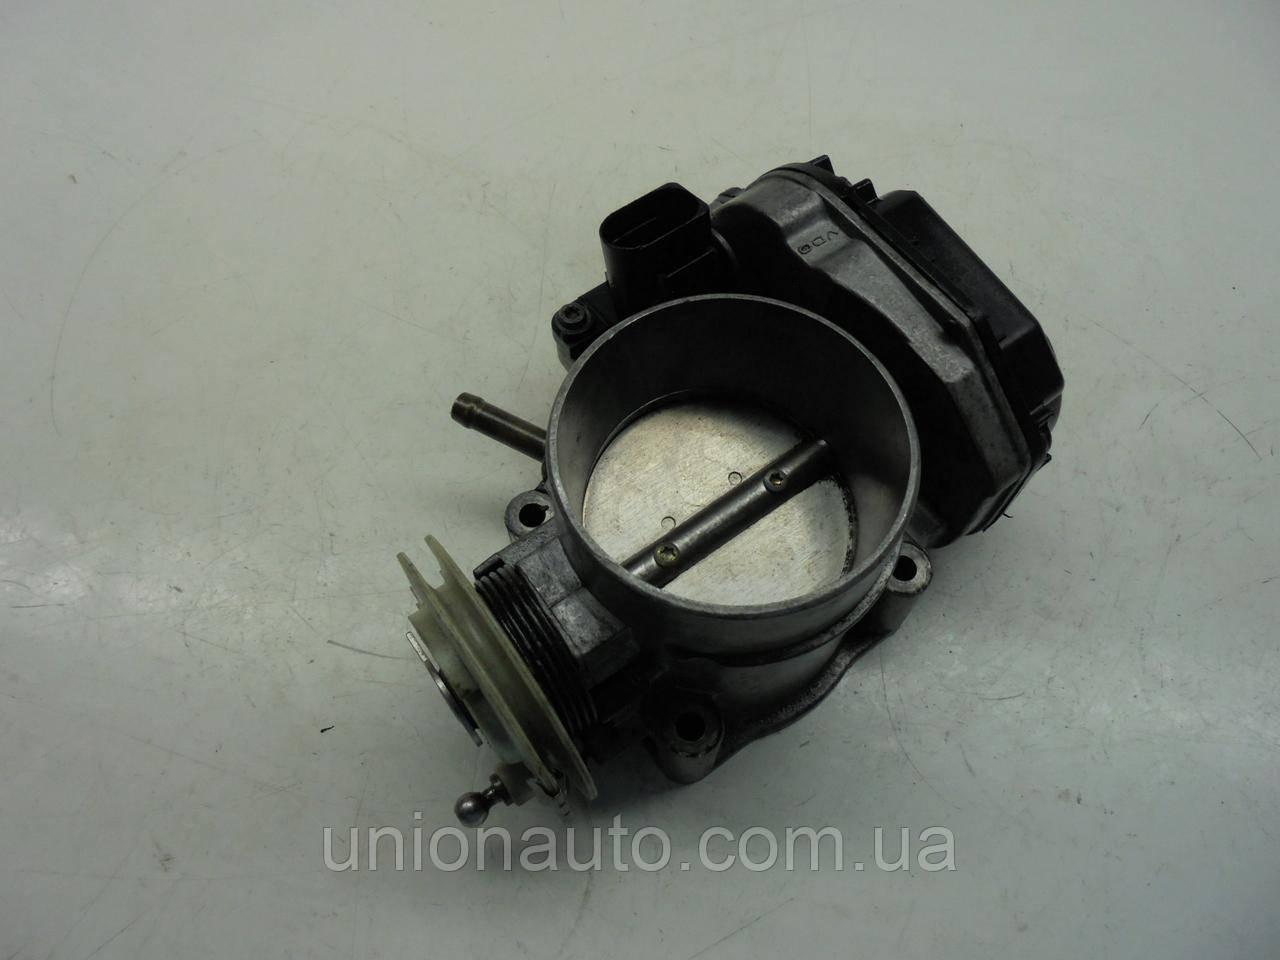 Дросельна заслінка AUDI A4 2.8 V6 078133063AB